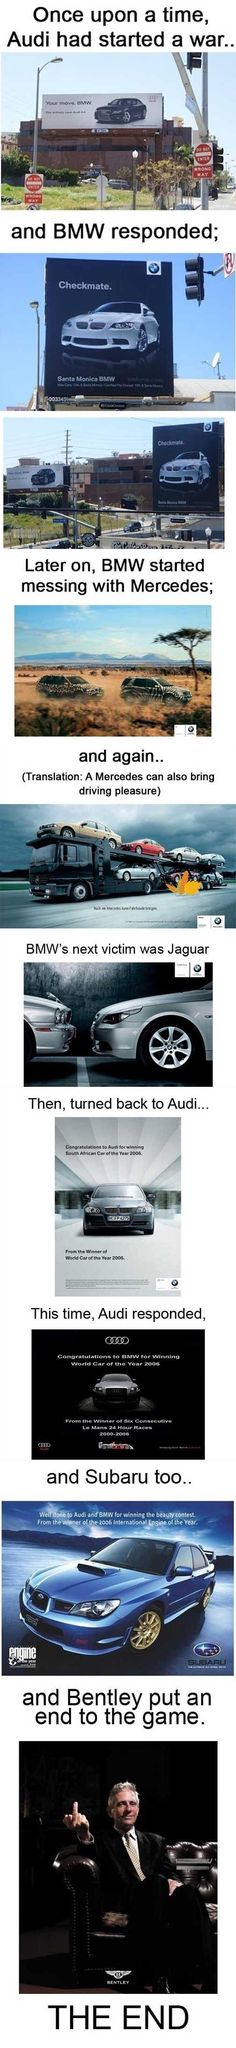 BMW's advertisement war! Audi Begin the war ! Funny add ( on board ) war between car brand ! Audi Vs BMW Vs Mercedes Vs Jaguar Vs Subaru(really Subaru?) Vs Bentley ! The End of the Story thanks to Bentley !!!???